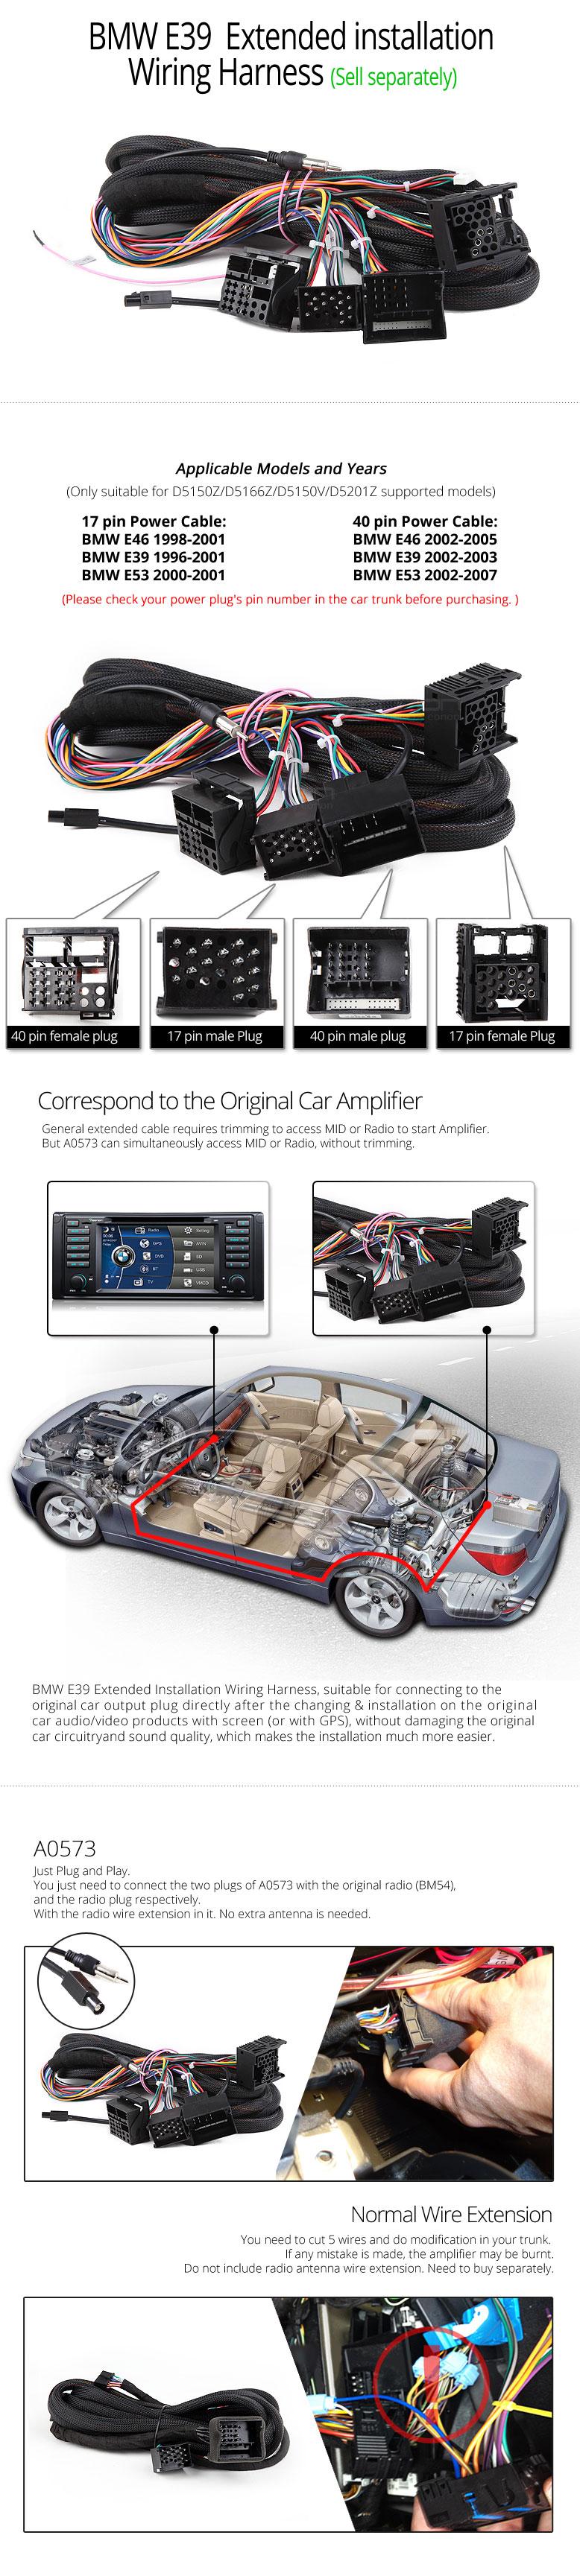 Bmw E39 Digital Touch Screen Multimedia Car Dvd Gps Upgraded D5124f Engine Wire Harness Eonon